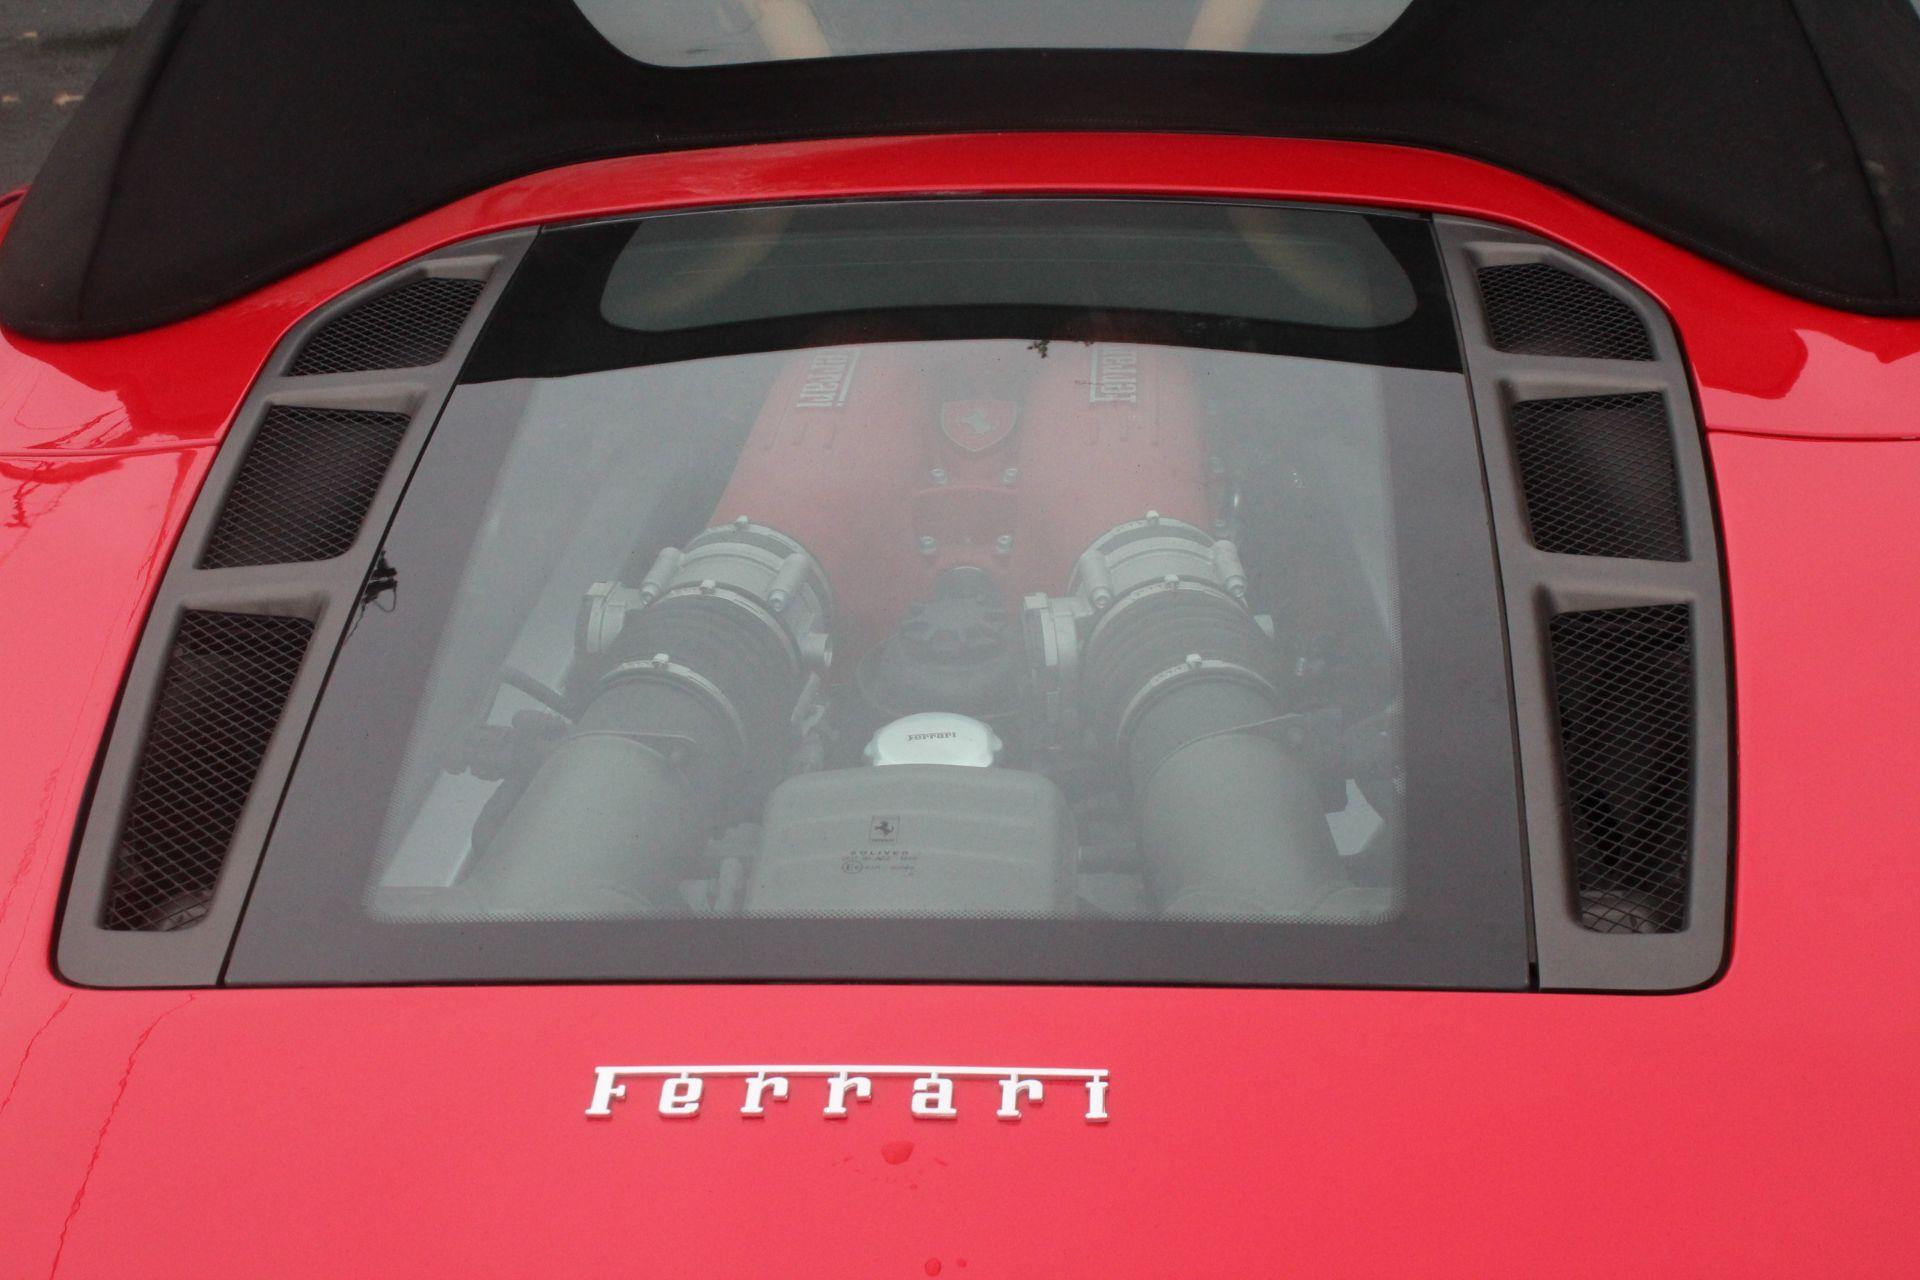 Lot 24 - 2007 FERRARI F430 SPIDER CONVERTIBLE, 4.3L V-8, AUTO. WITH PADDLE SHIFTERS, VIN ZFFEW59A470155563,